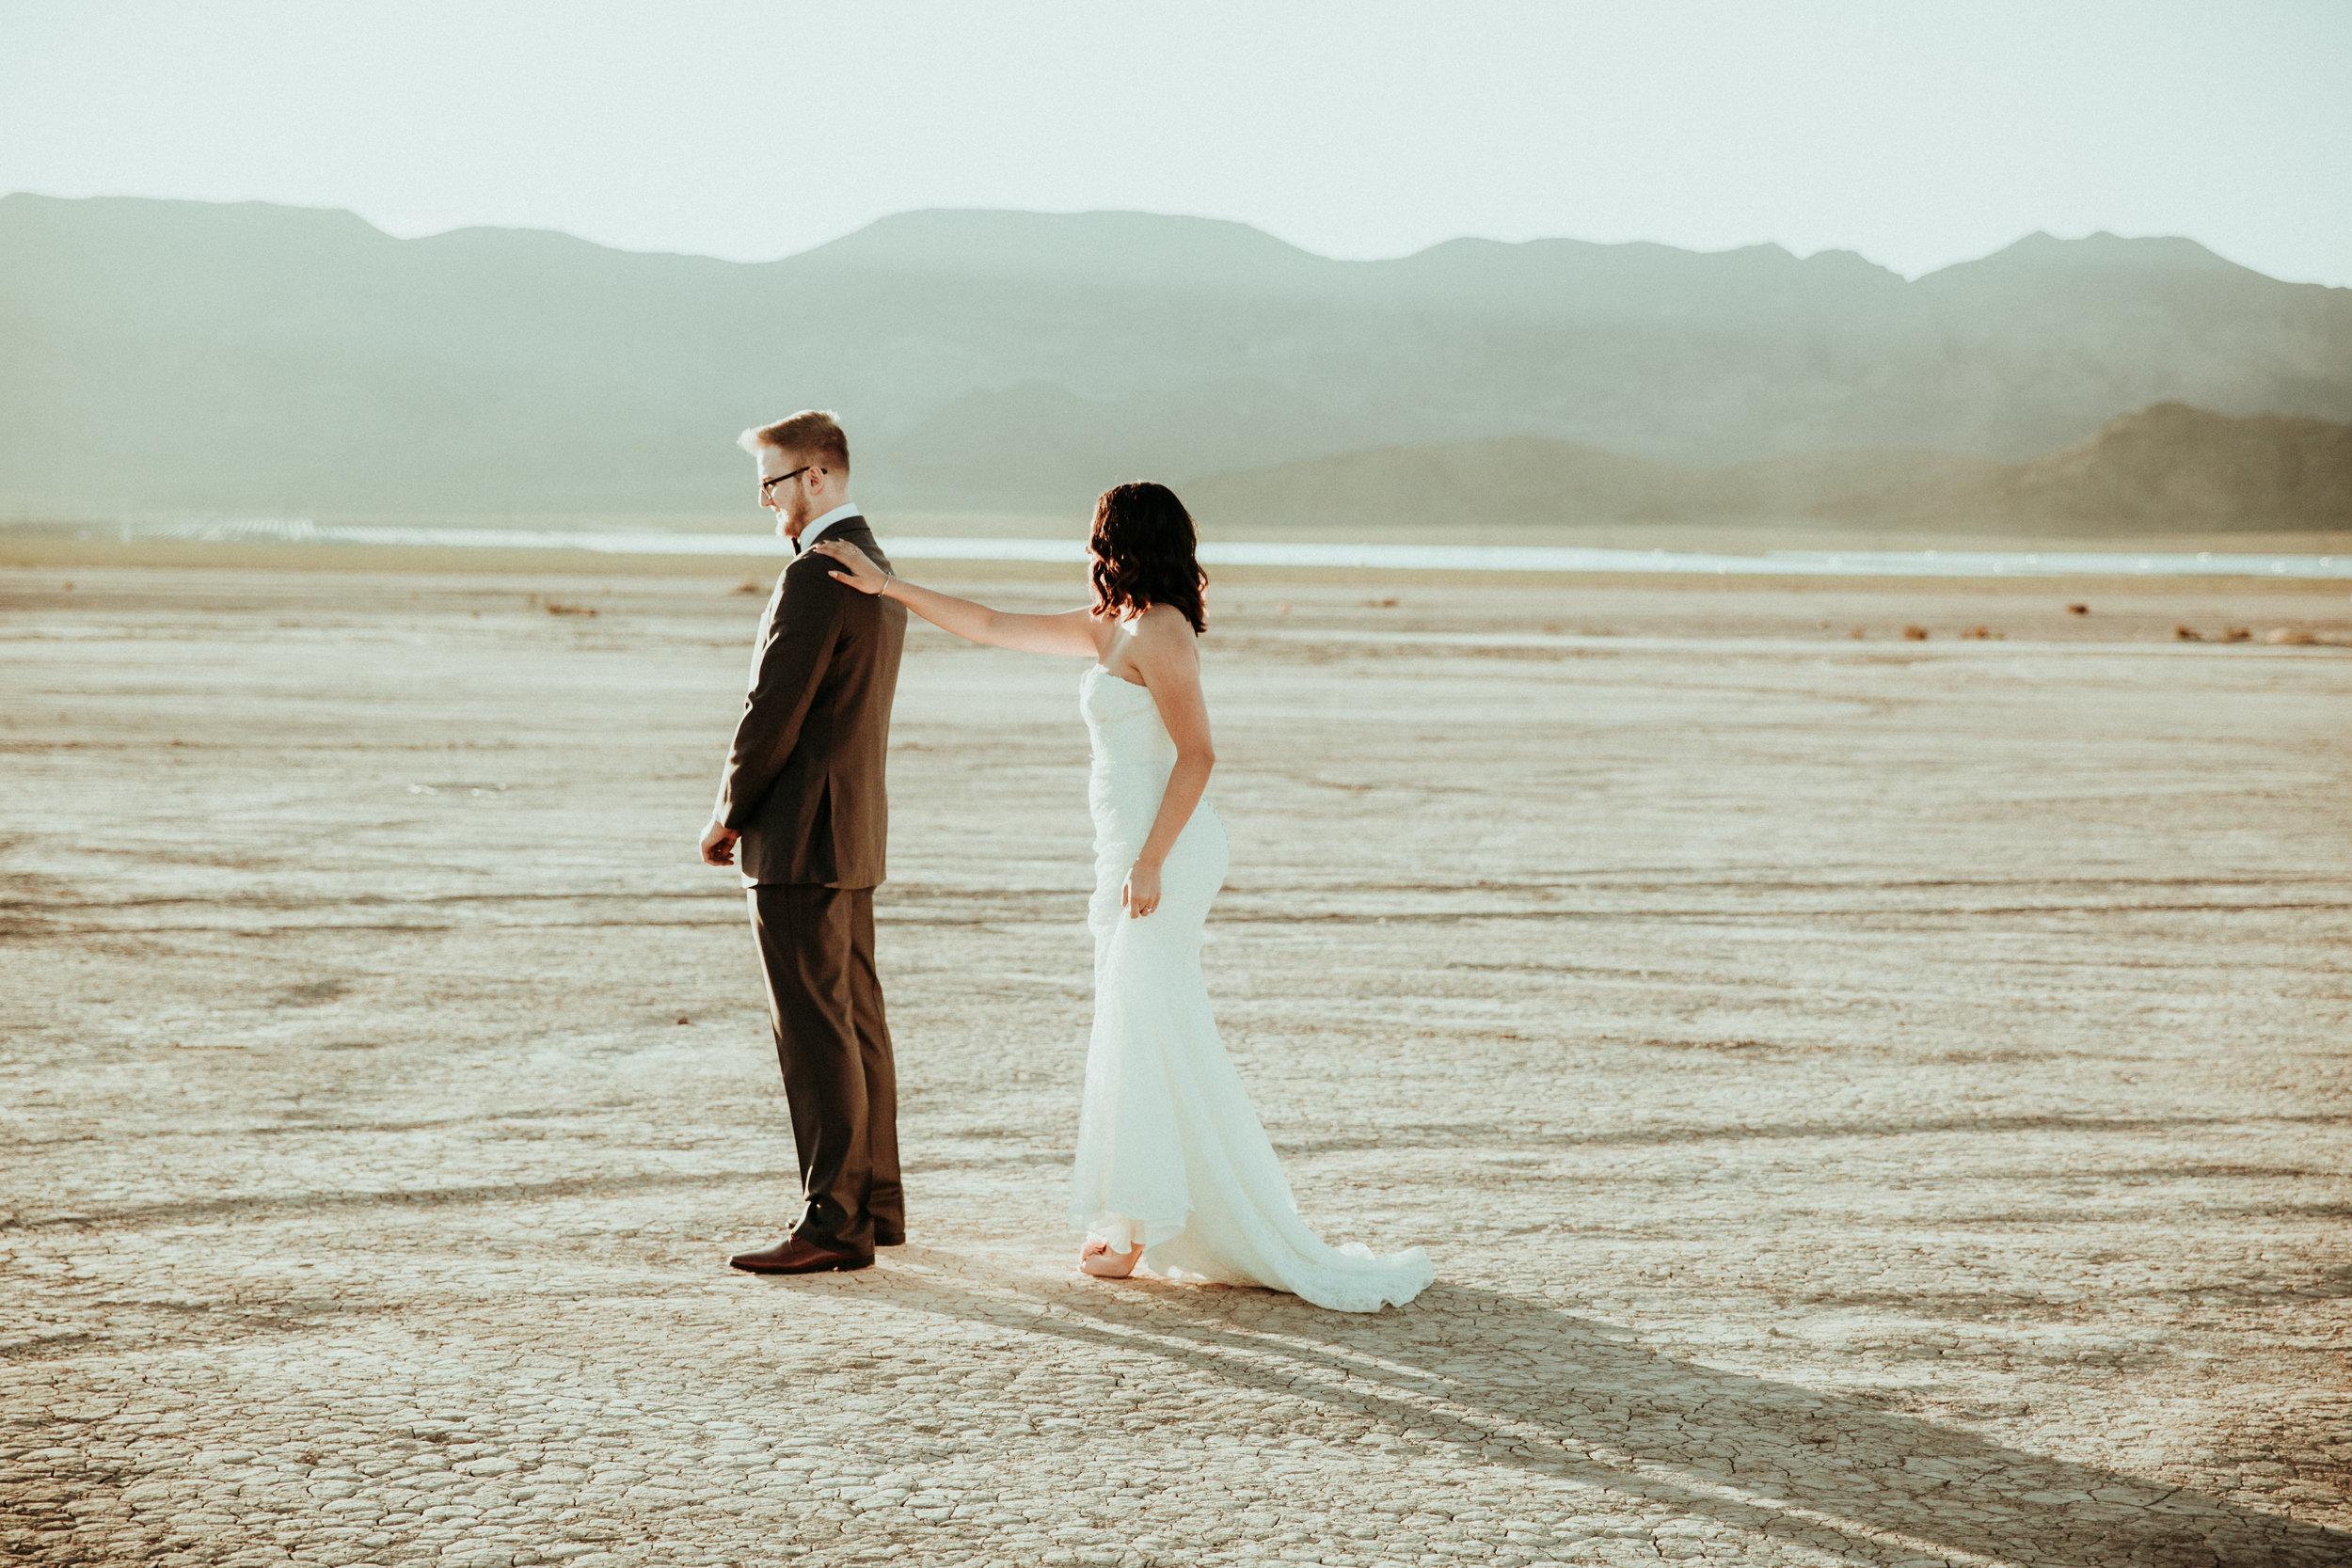 Las Vegas Wedding Photographer - Seattle Wedding Photography - Henderson, NV - First Look Session